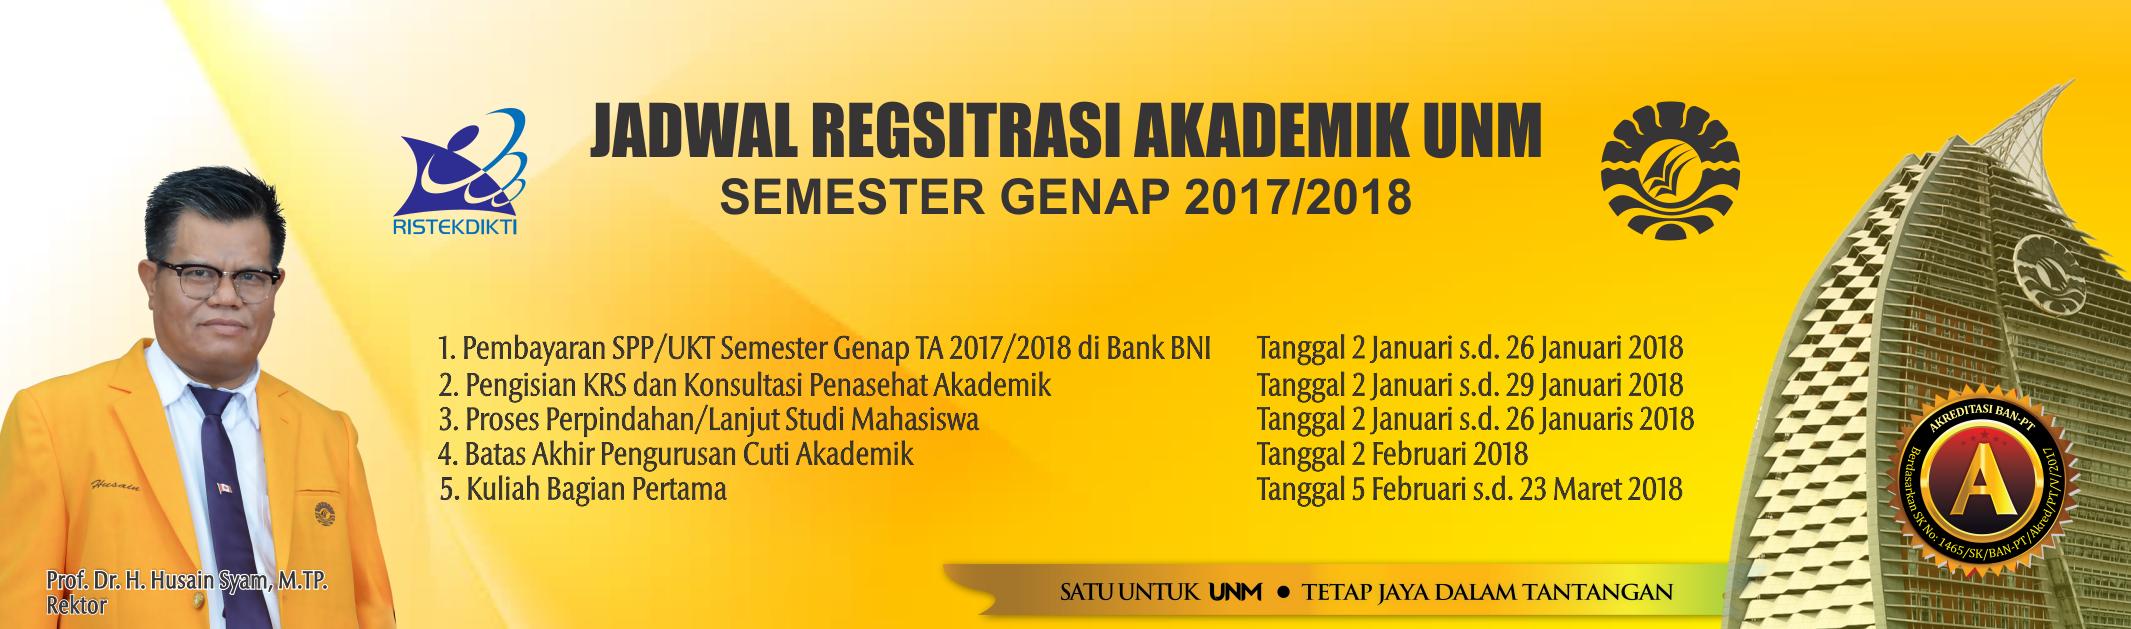 Jadwal Registrasi Akademik UNM